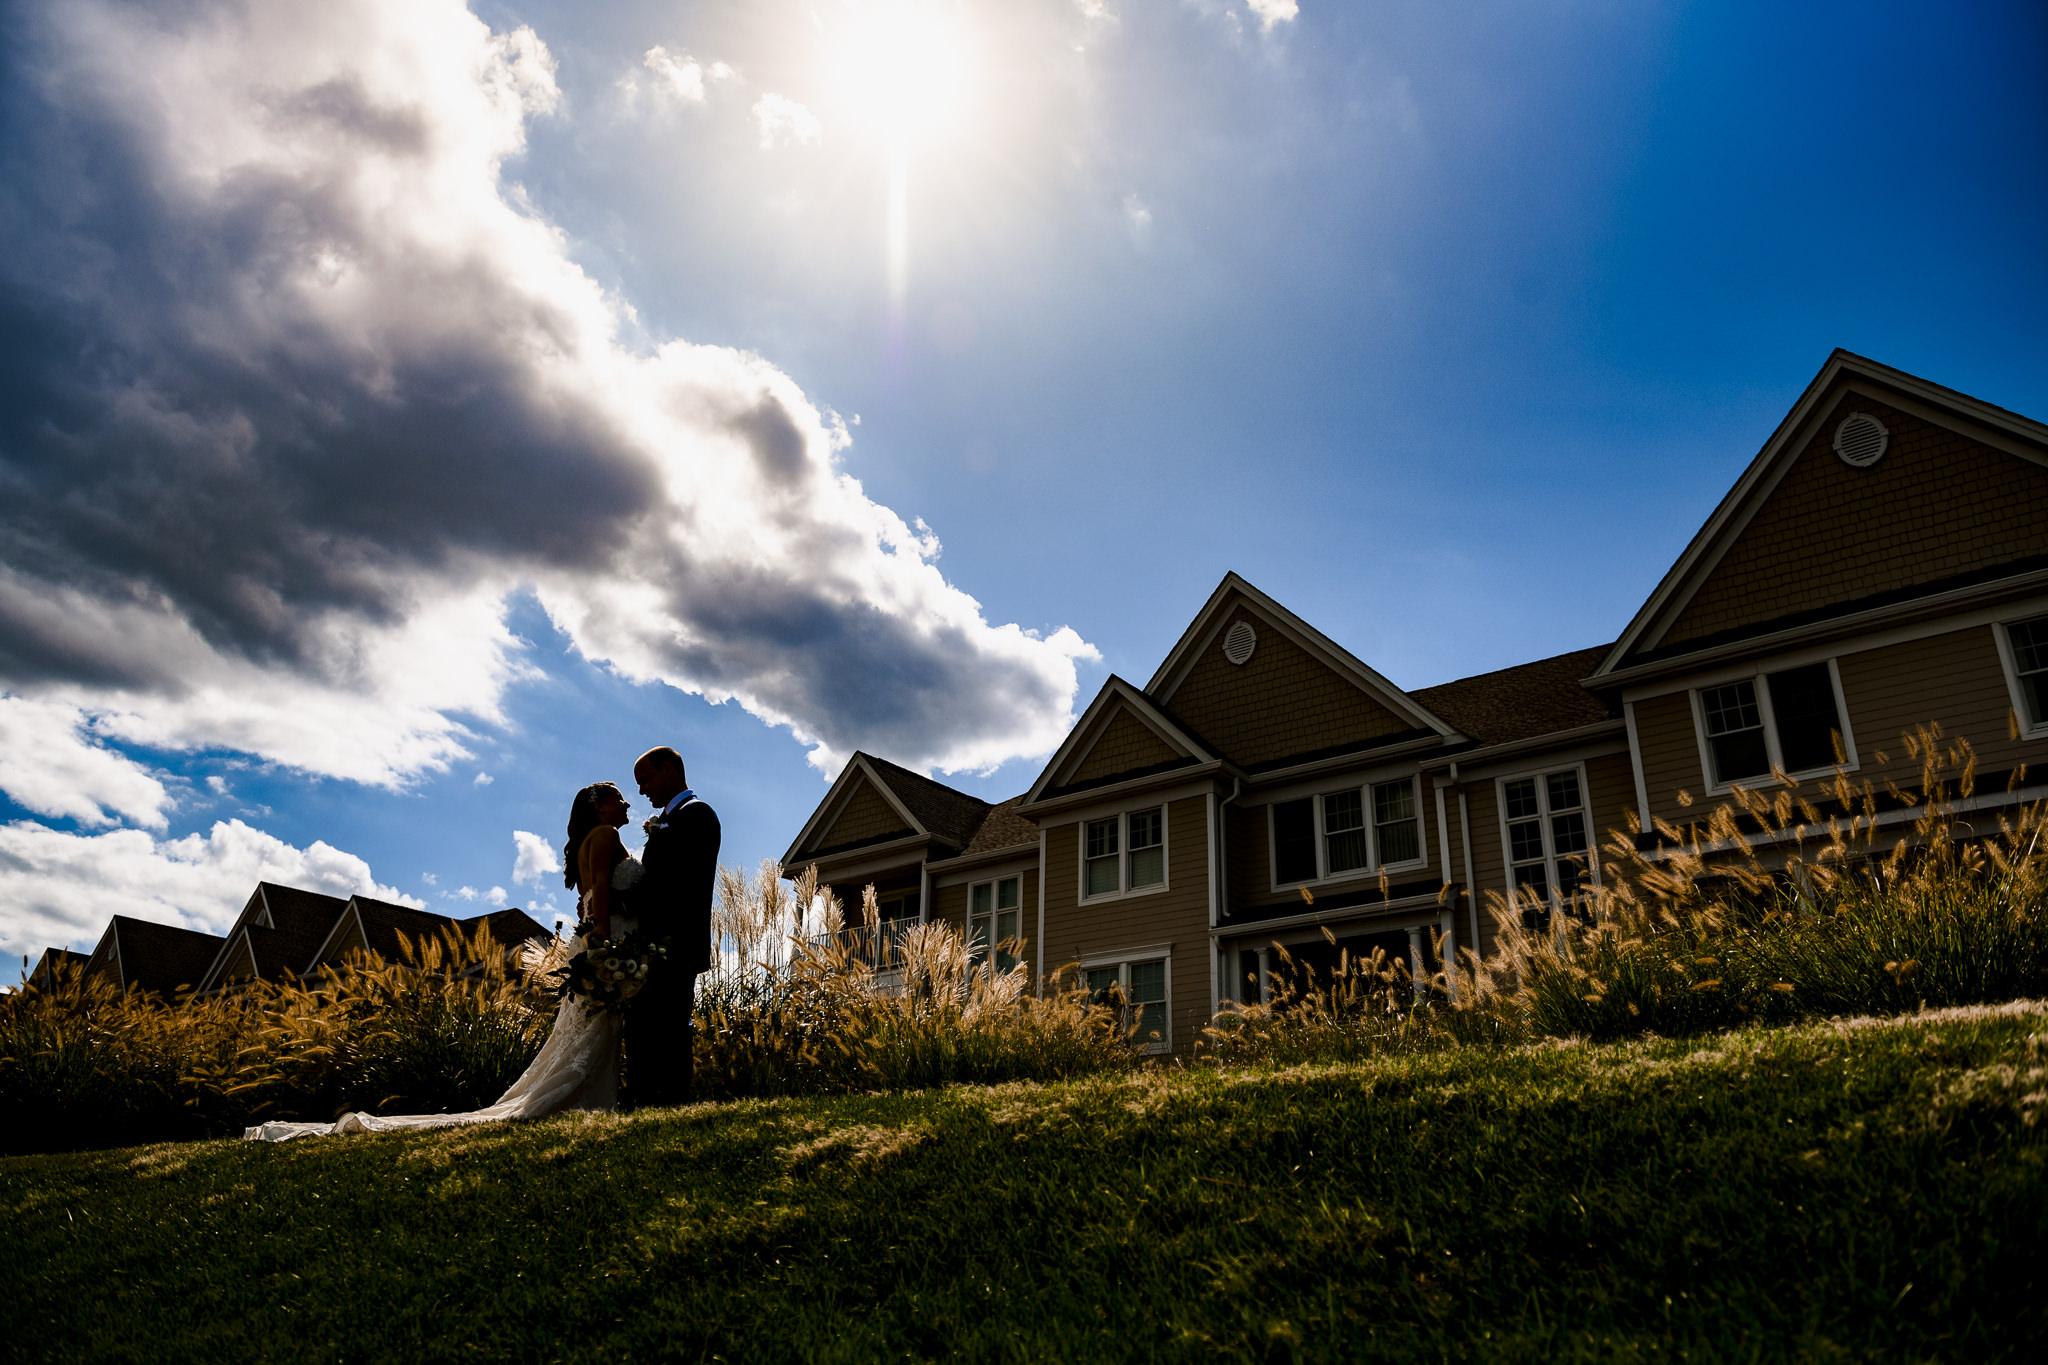 Culos-Sheraton-Eatontown-Long-Branch-Wedding-Photographer-05.JPG